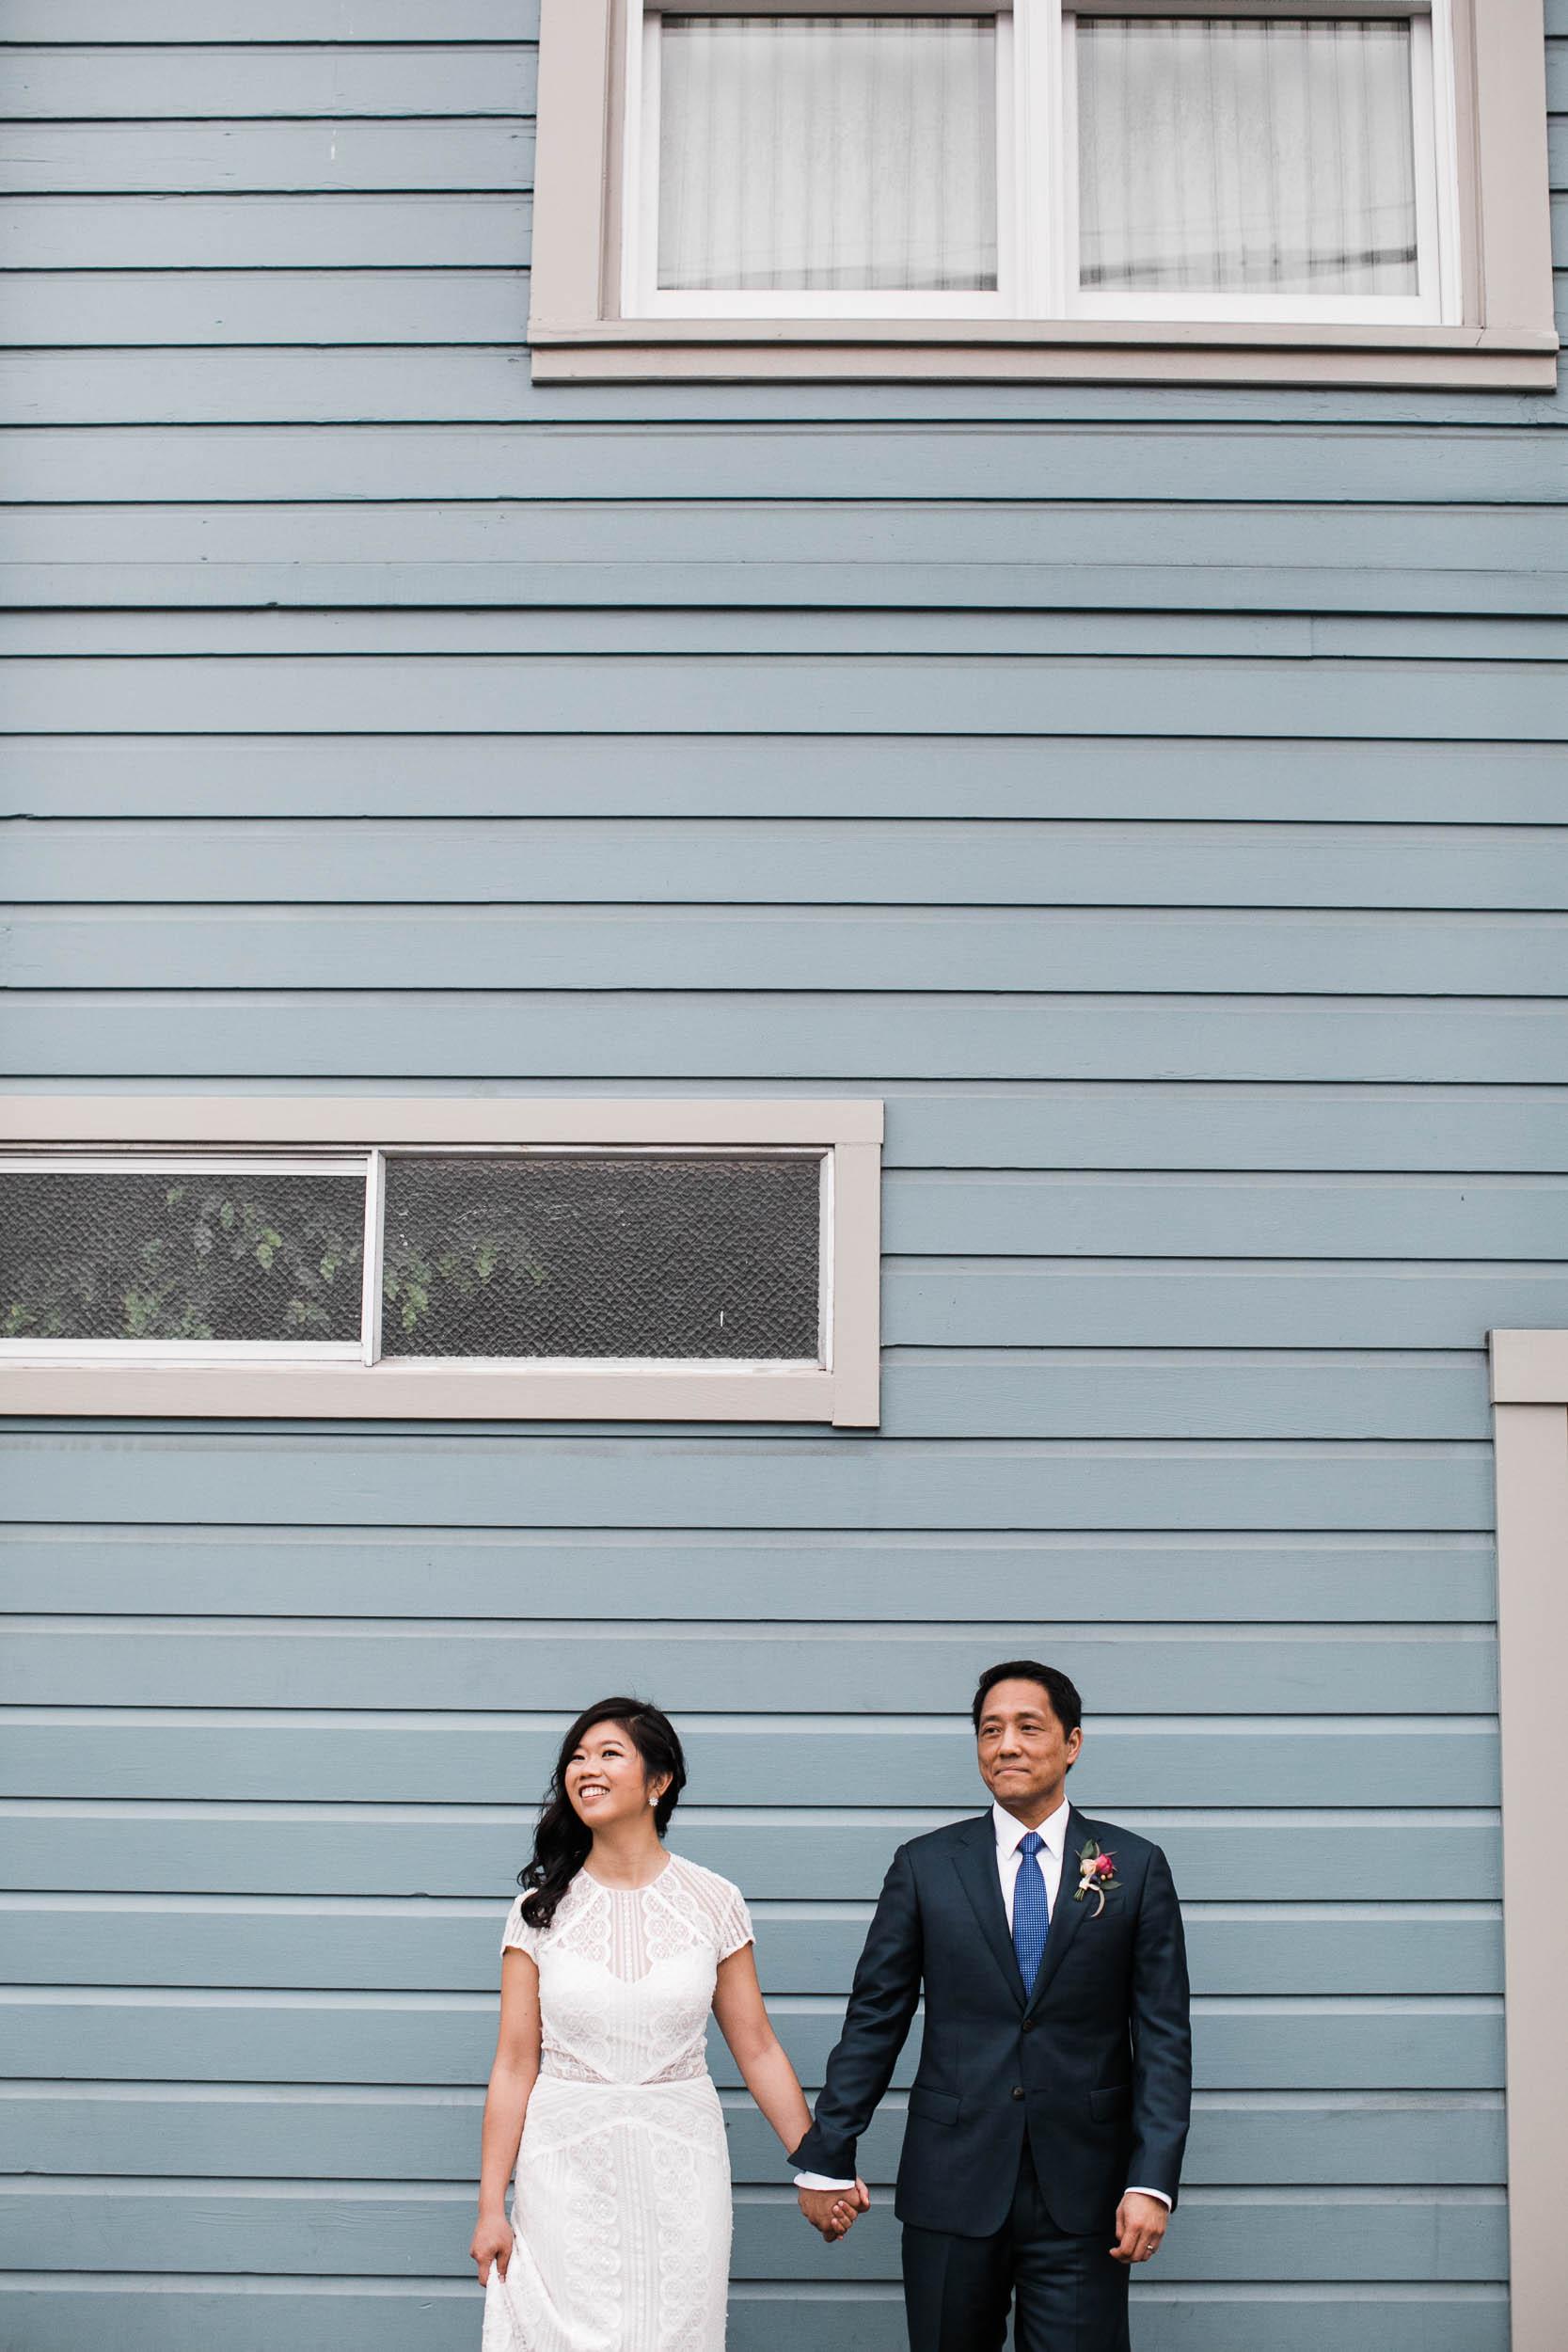 032118_M+D City Hall Wedding_Buena Lane Photography_1183.jpg